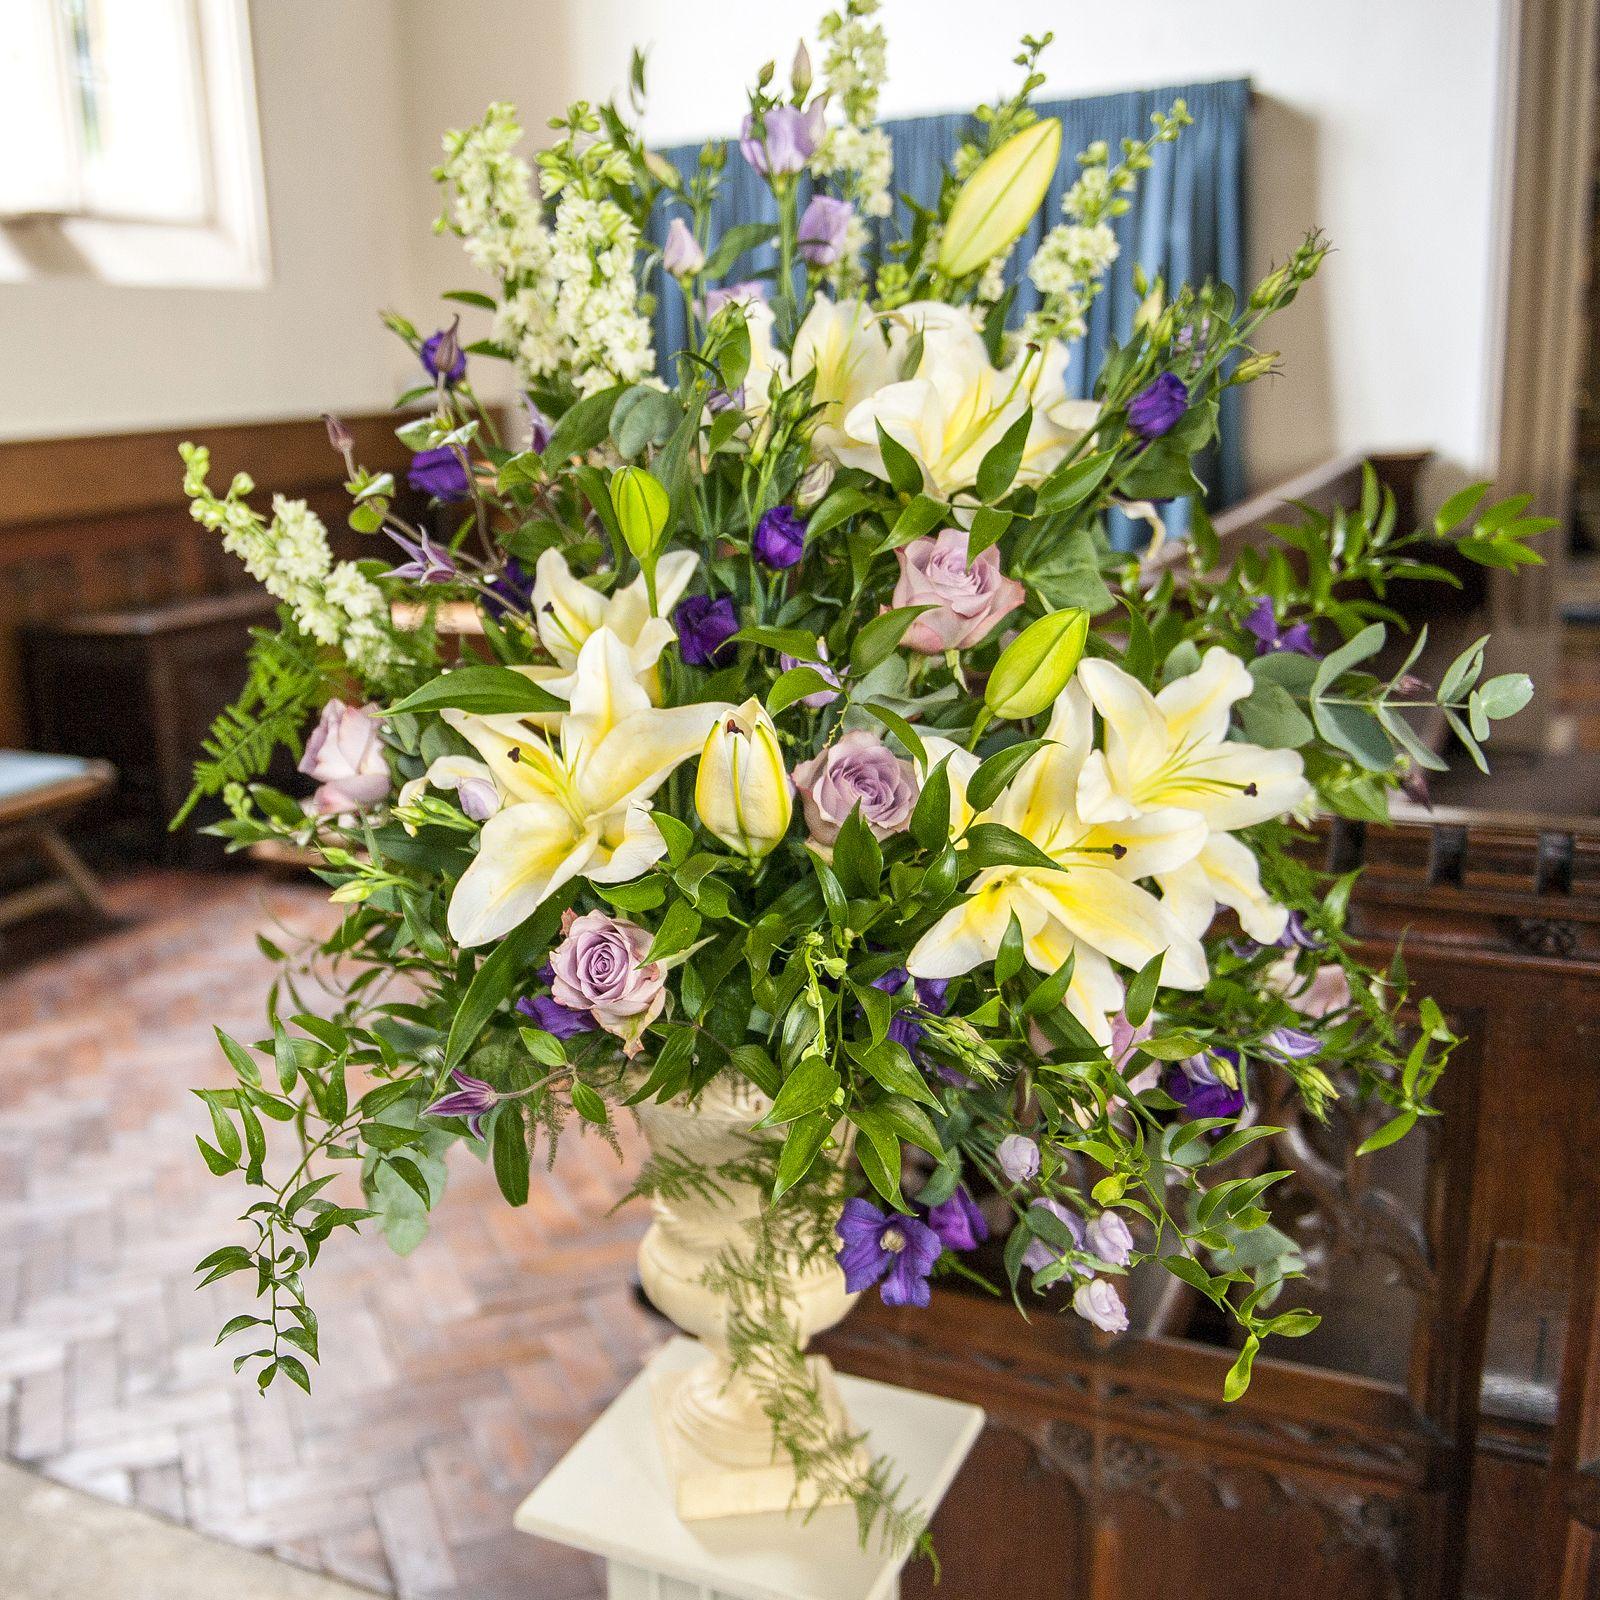 Floral Urns For Weddings: Wedding Flower Ideas